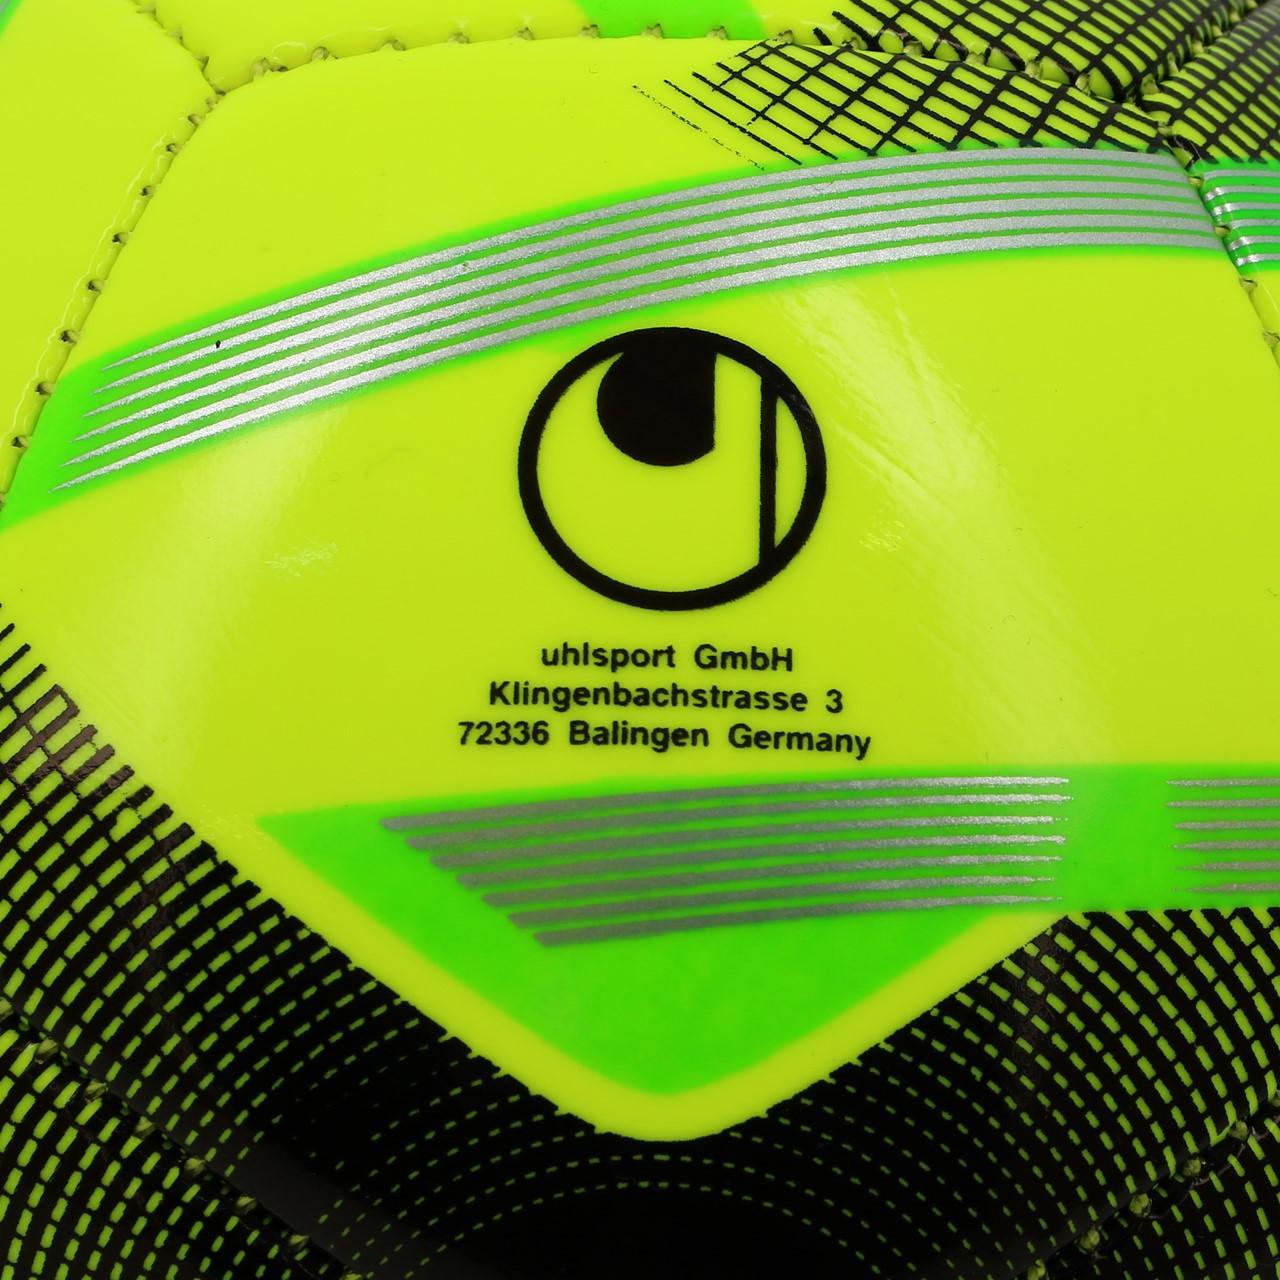 Mini-Ball-Uhlsport-Team-Mini-taille1-Yellow-50001-New thumbnail 4